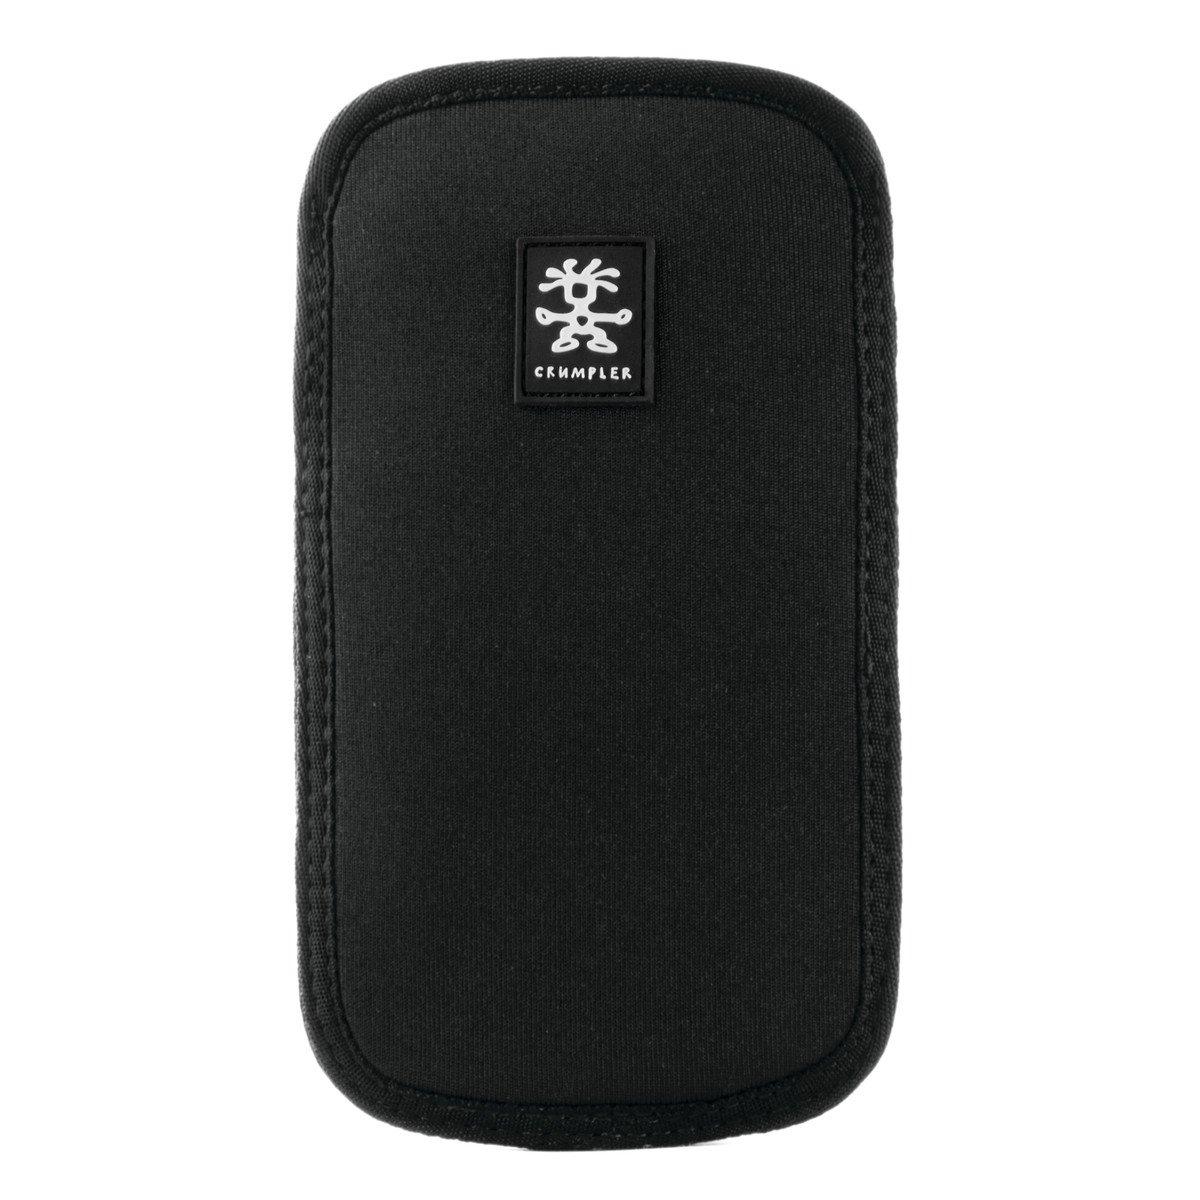 CRUMPLER Base Layer Smart Phone 95